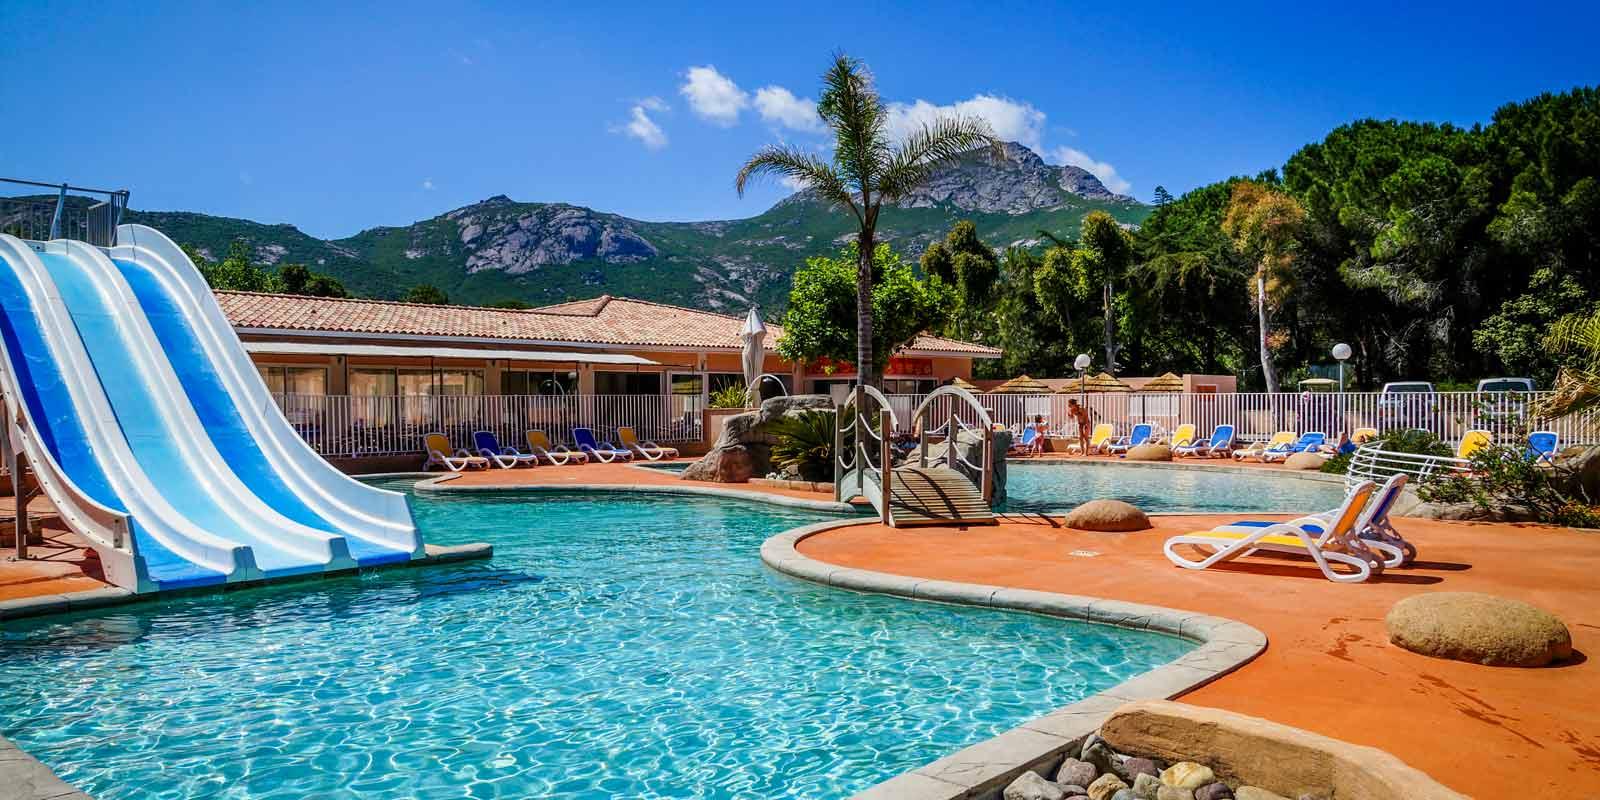 Campsite Corsica | Calvi | Northern Corsica | Ile Rousse ... concernant Camping Var Avec Piscine